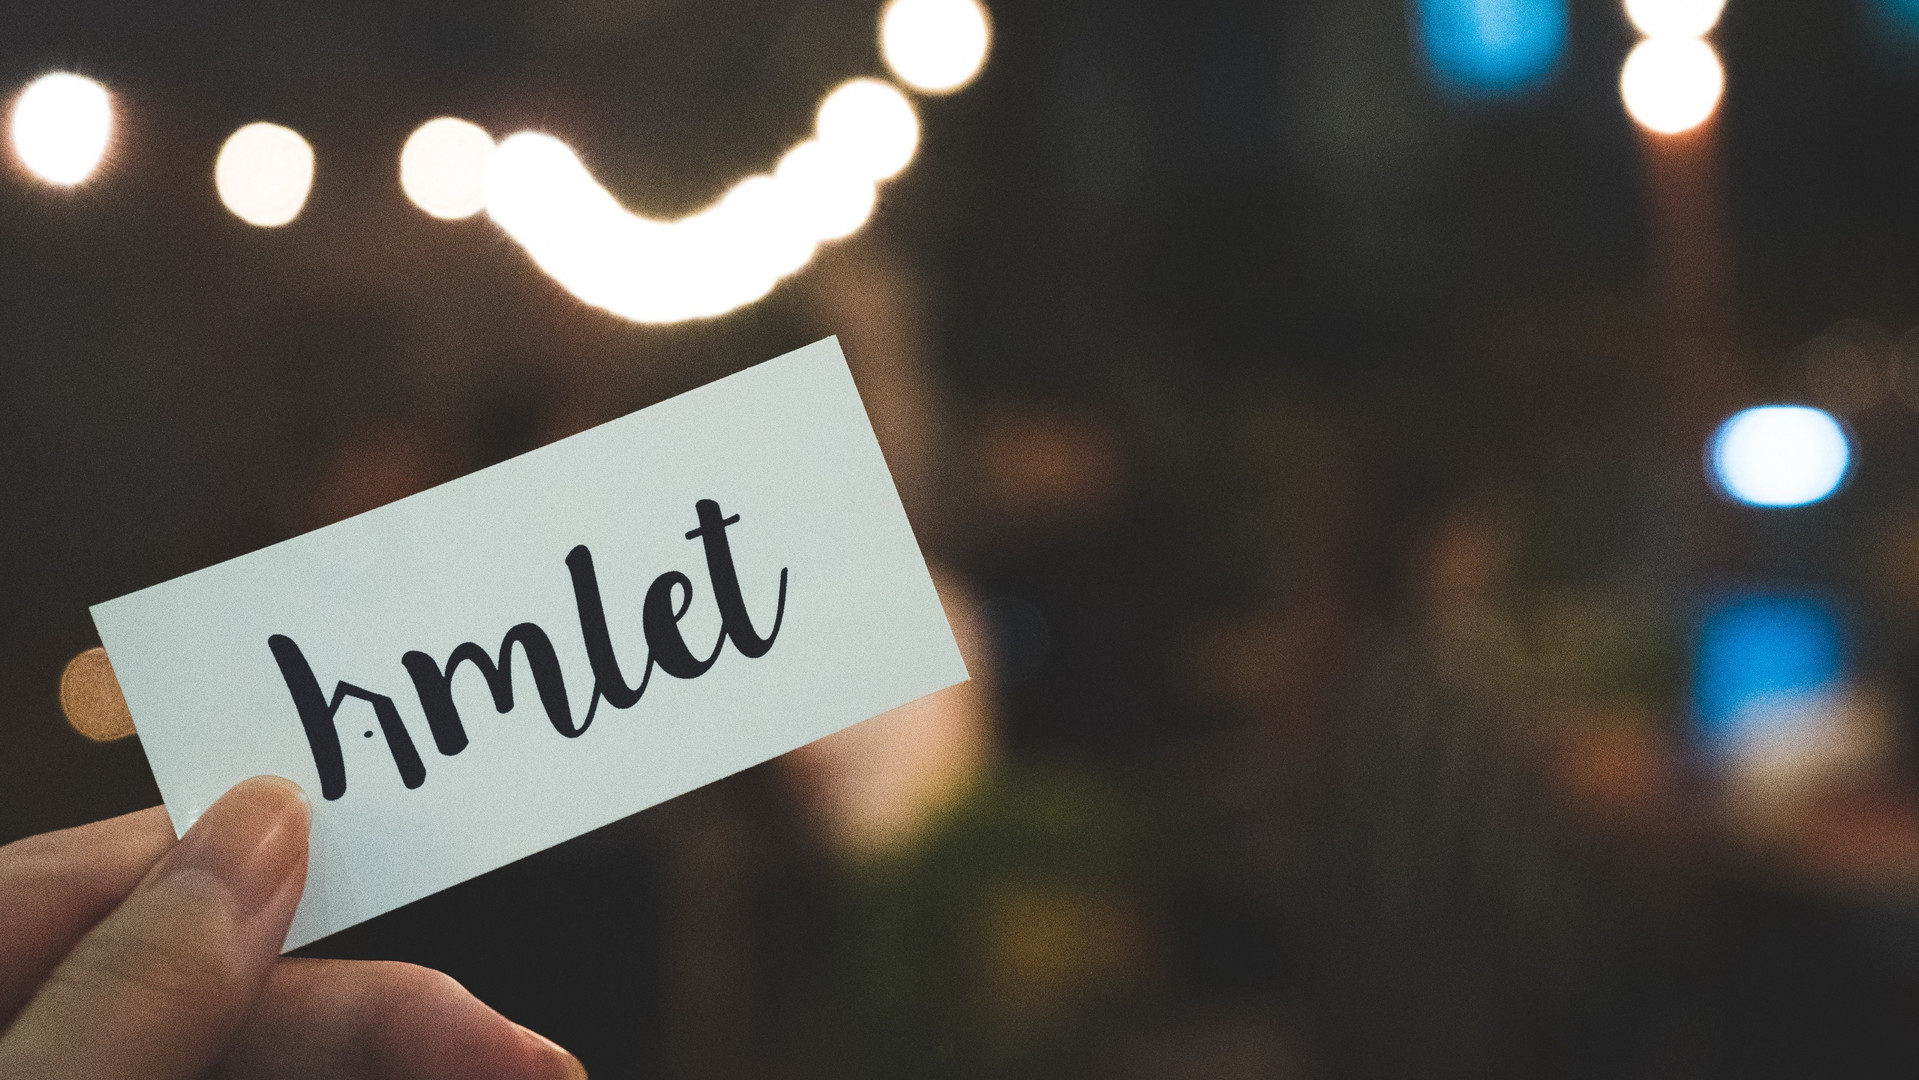 Hmlet_MembersNight-FEB2019-Other-EventPh